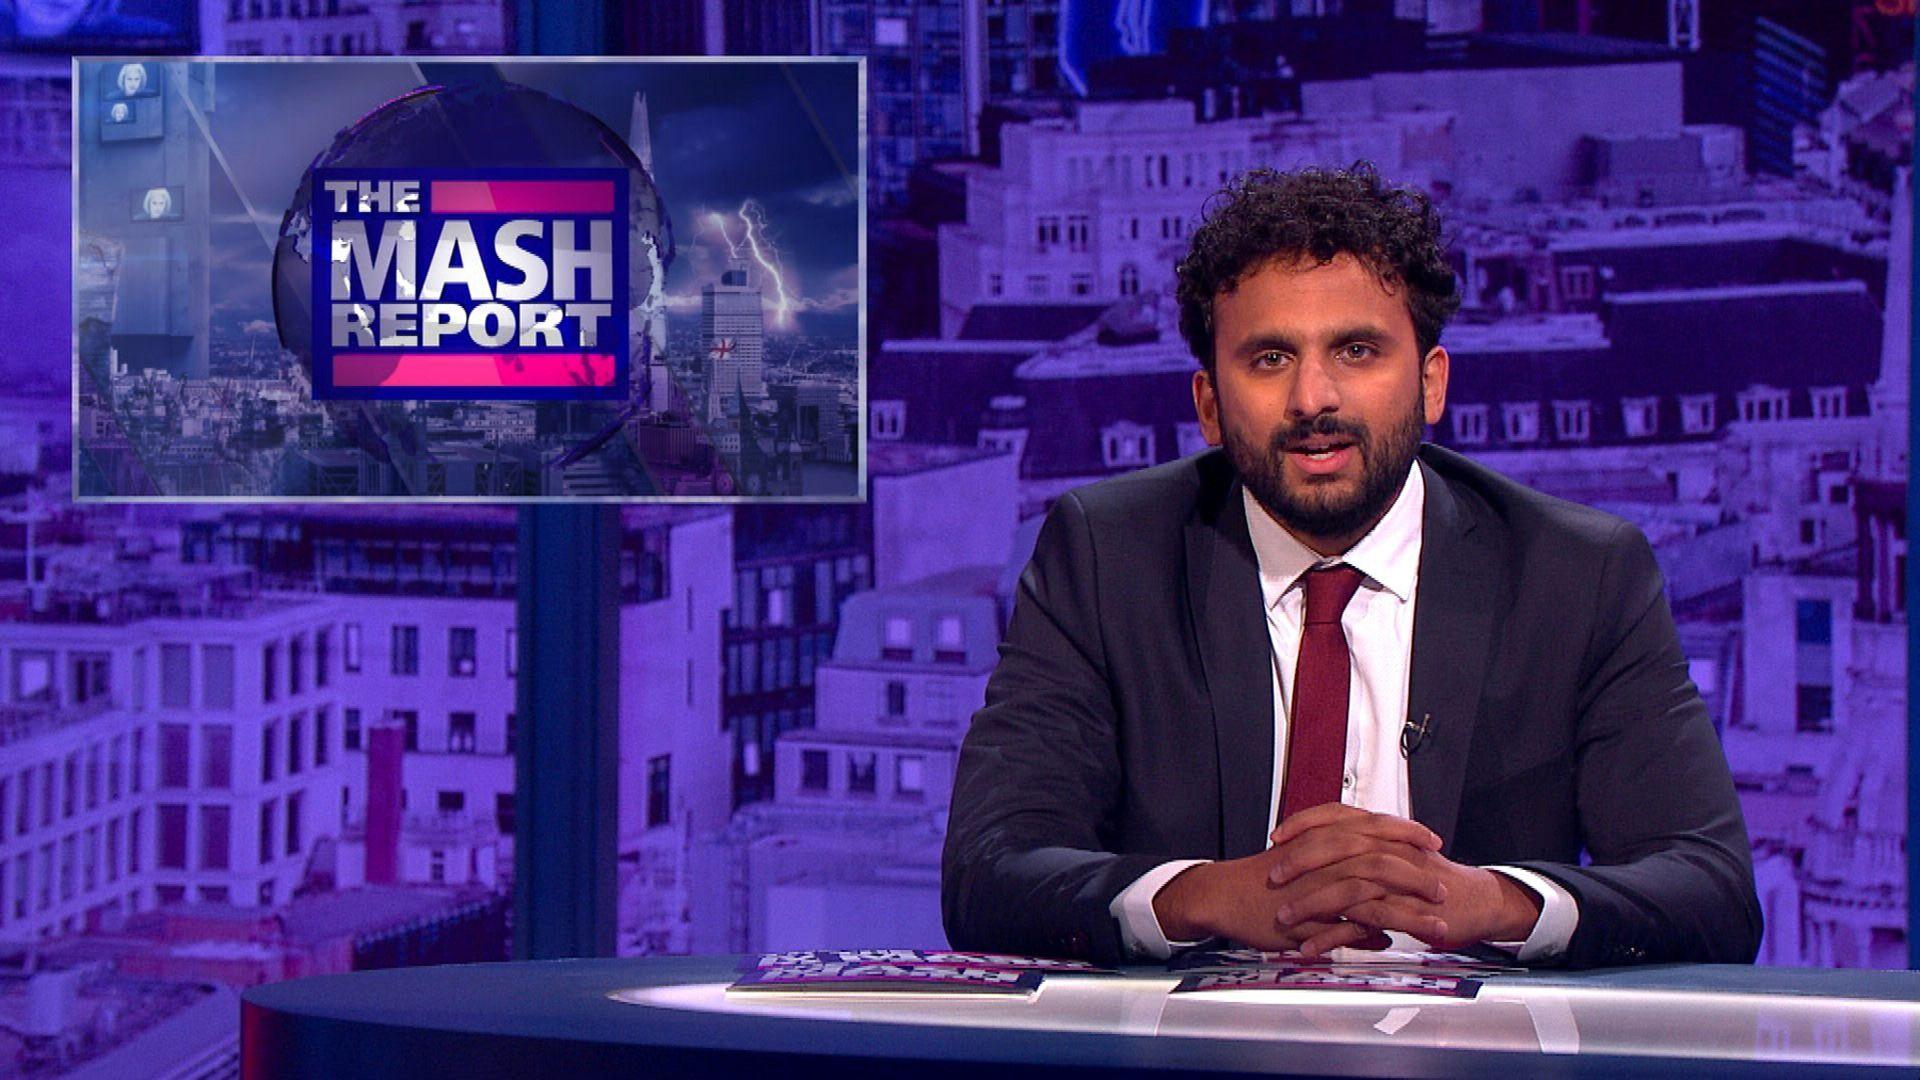 Nish Kumar on the BBC's Mash Report - Credit: BBC